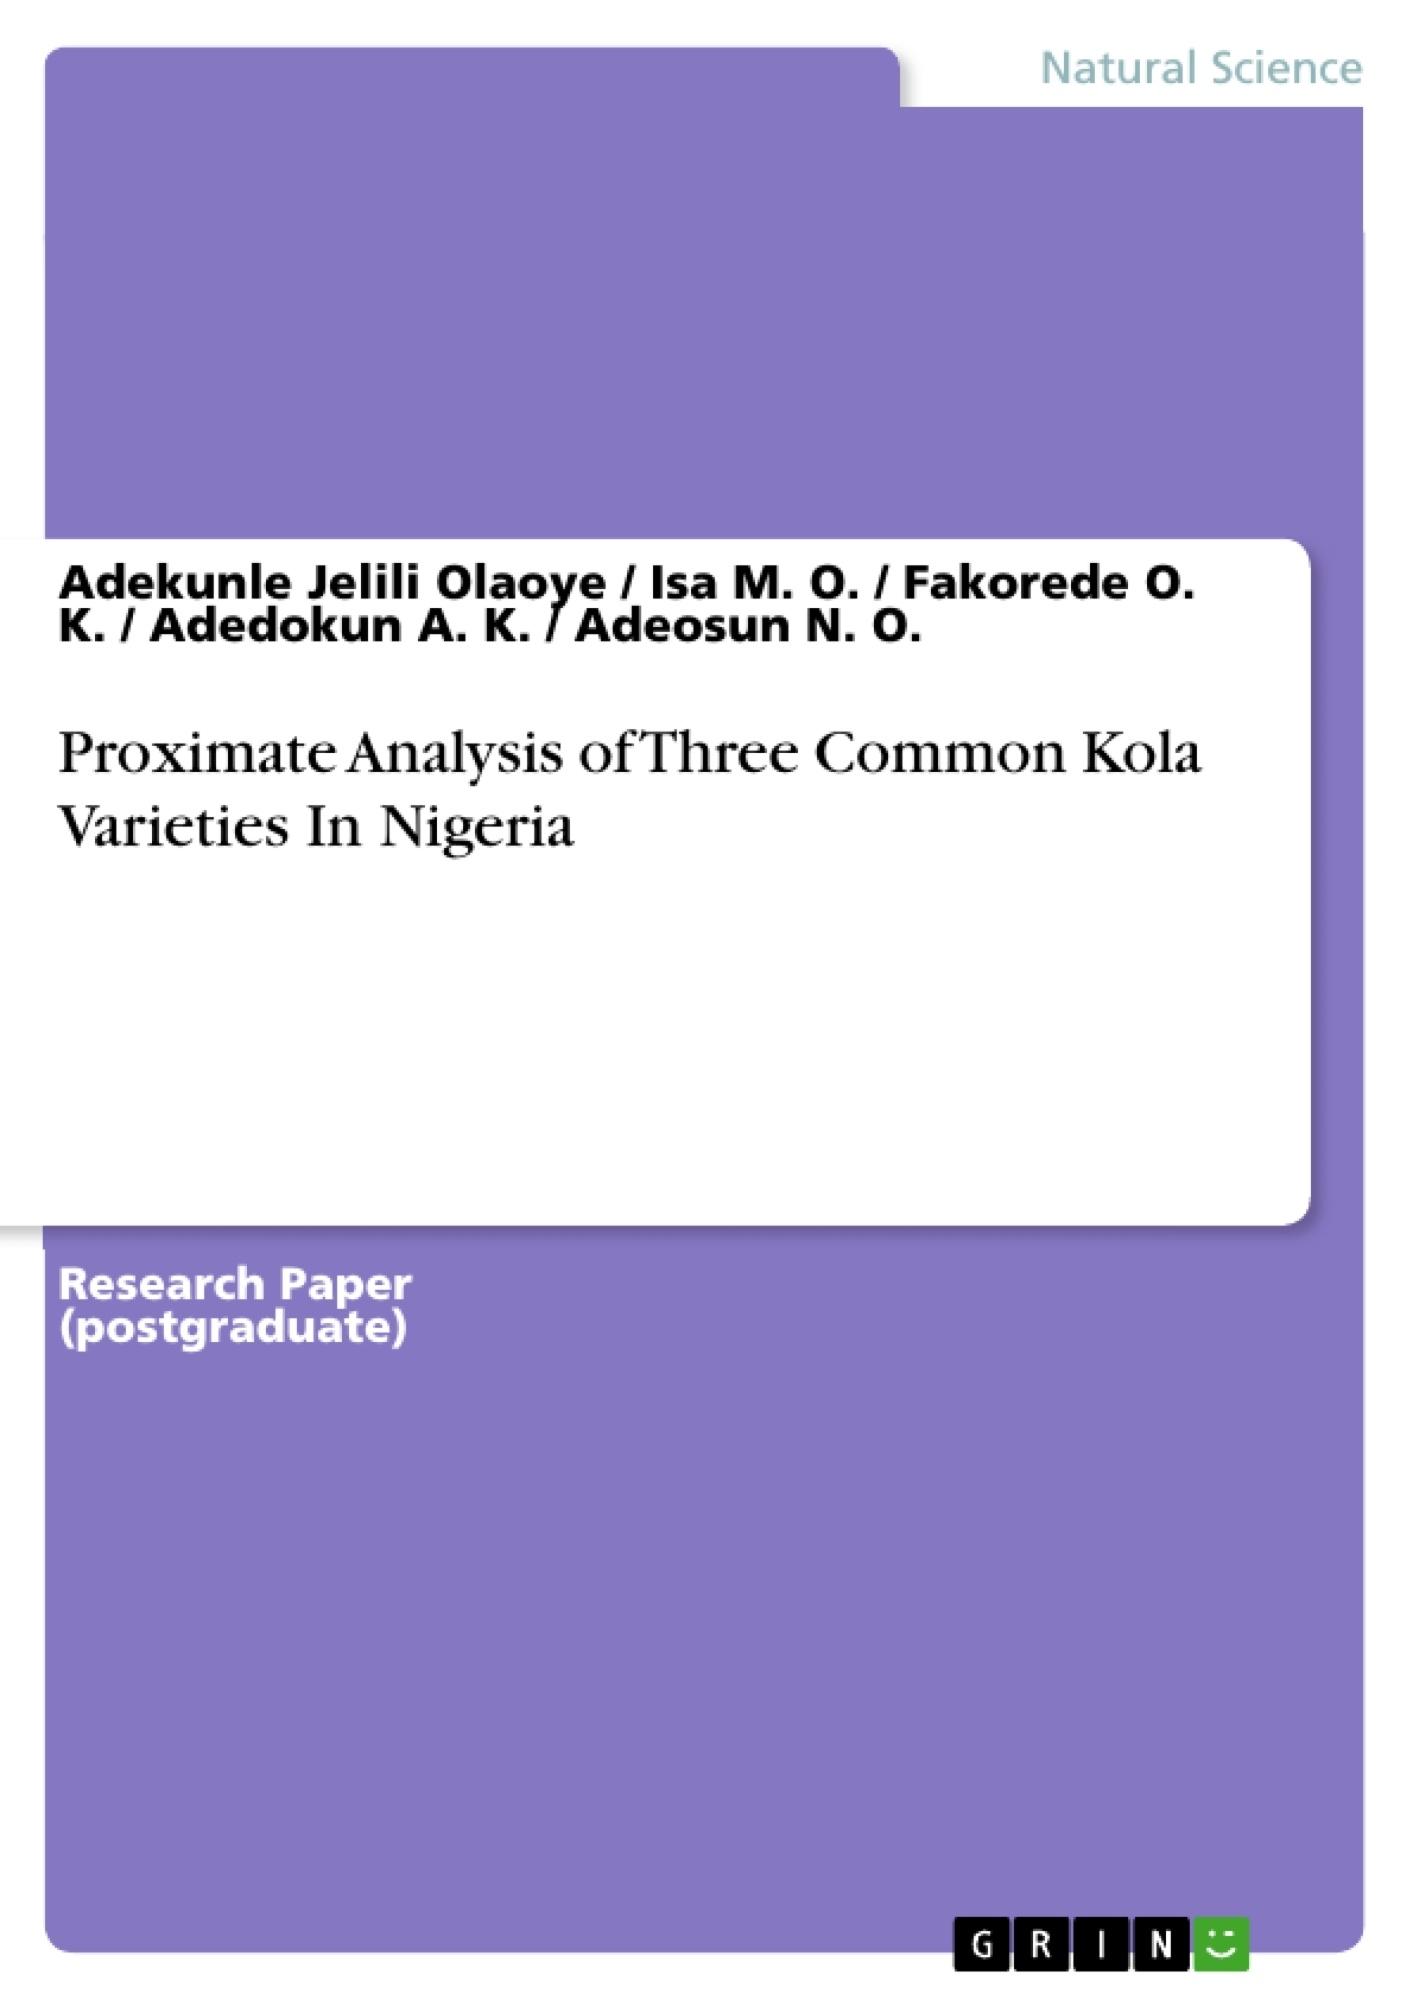 GRIN - Proximate Analysis of Three Common Kola Varieties In Nigeria